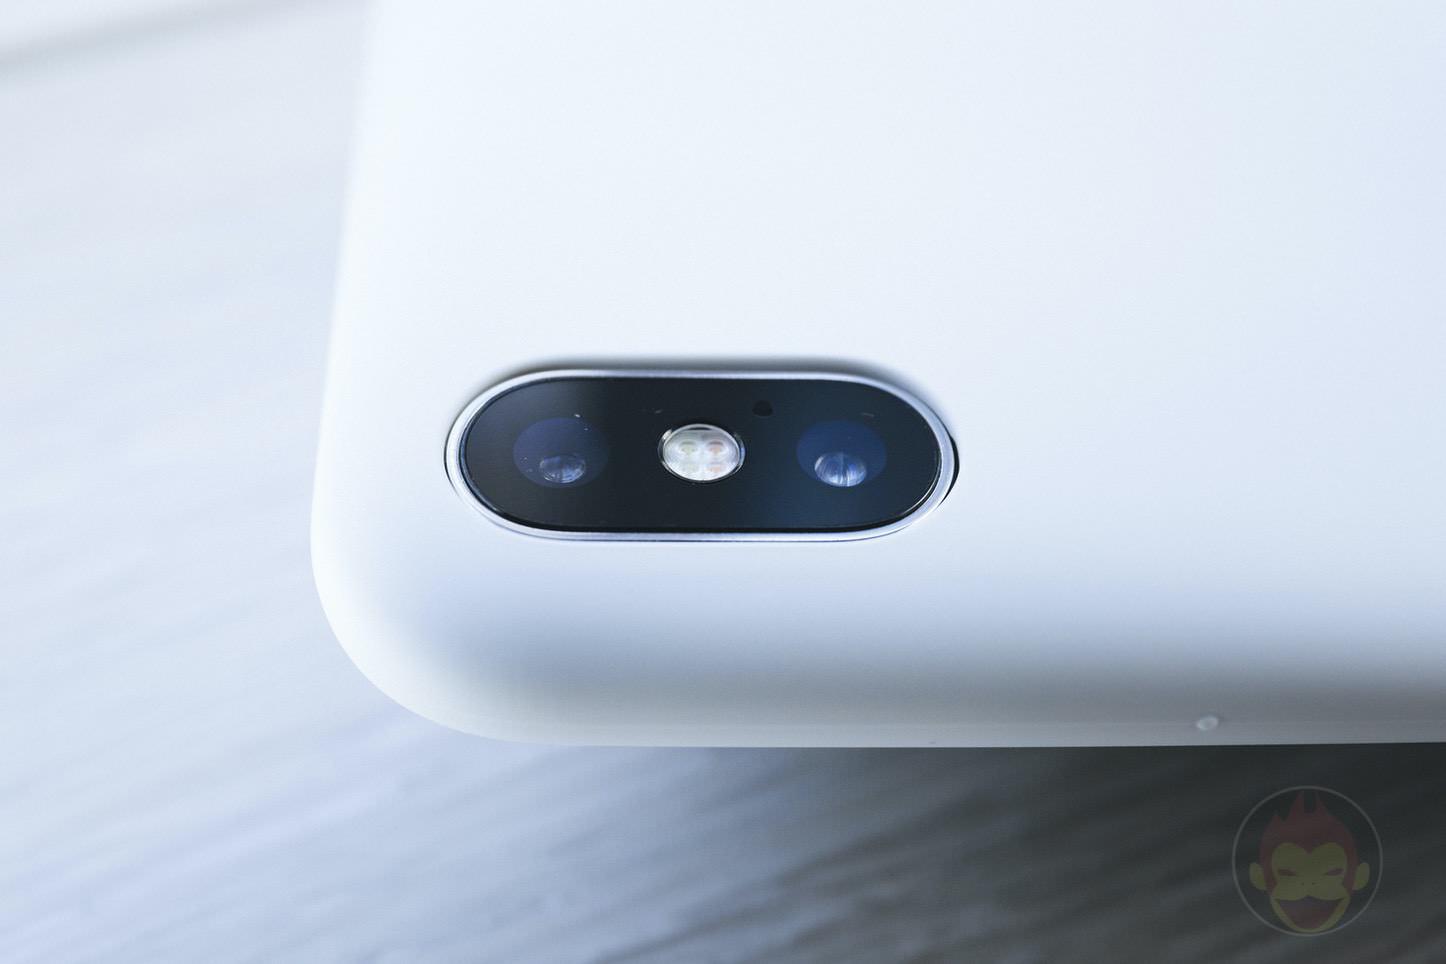 Mynus-iPhoneX-Case-Black-White-03.jpg